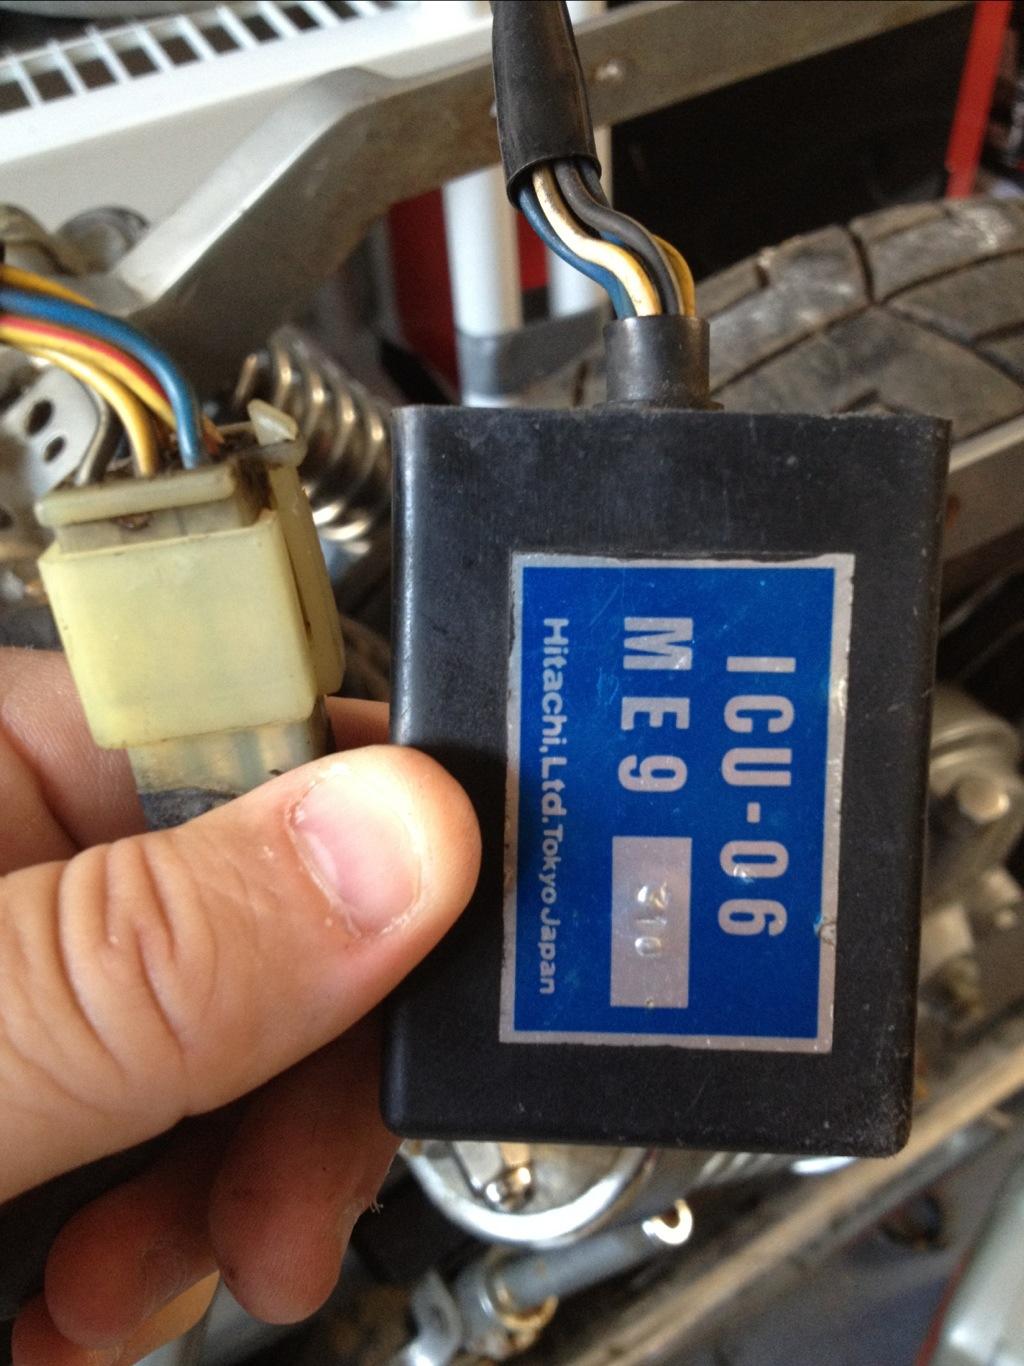 [SCHEMATICS_4HG]  1984 Honda Shadow VT700C Brain Transplant - Oden Motor Shop | Vt700 Wiring Diagram |  | Oden Motor Shop